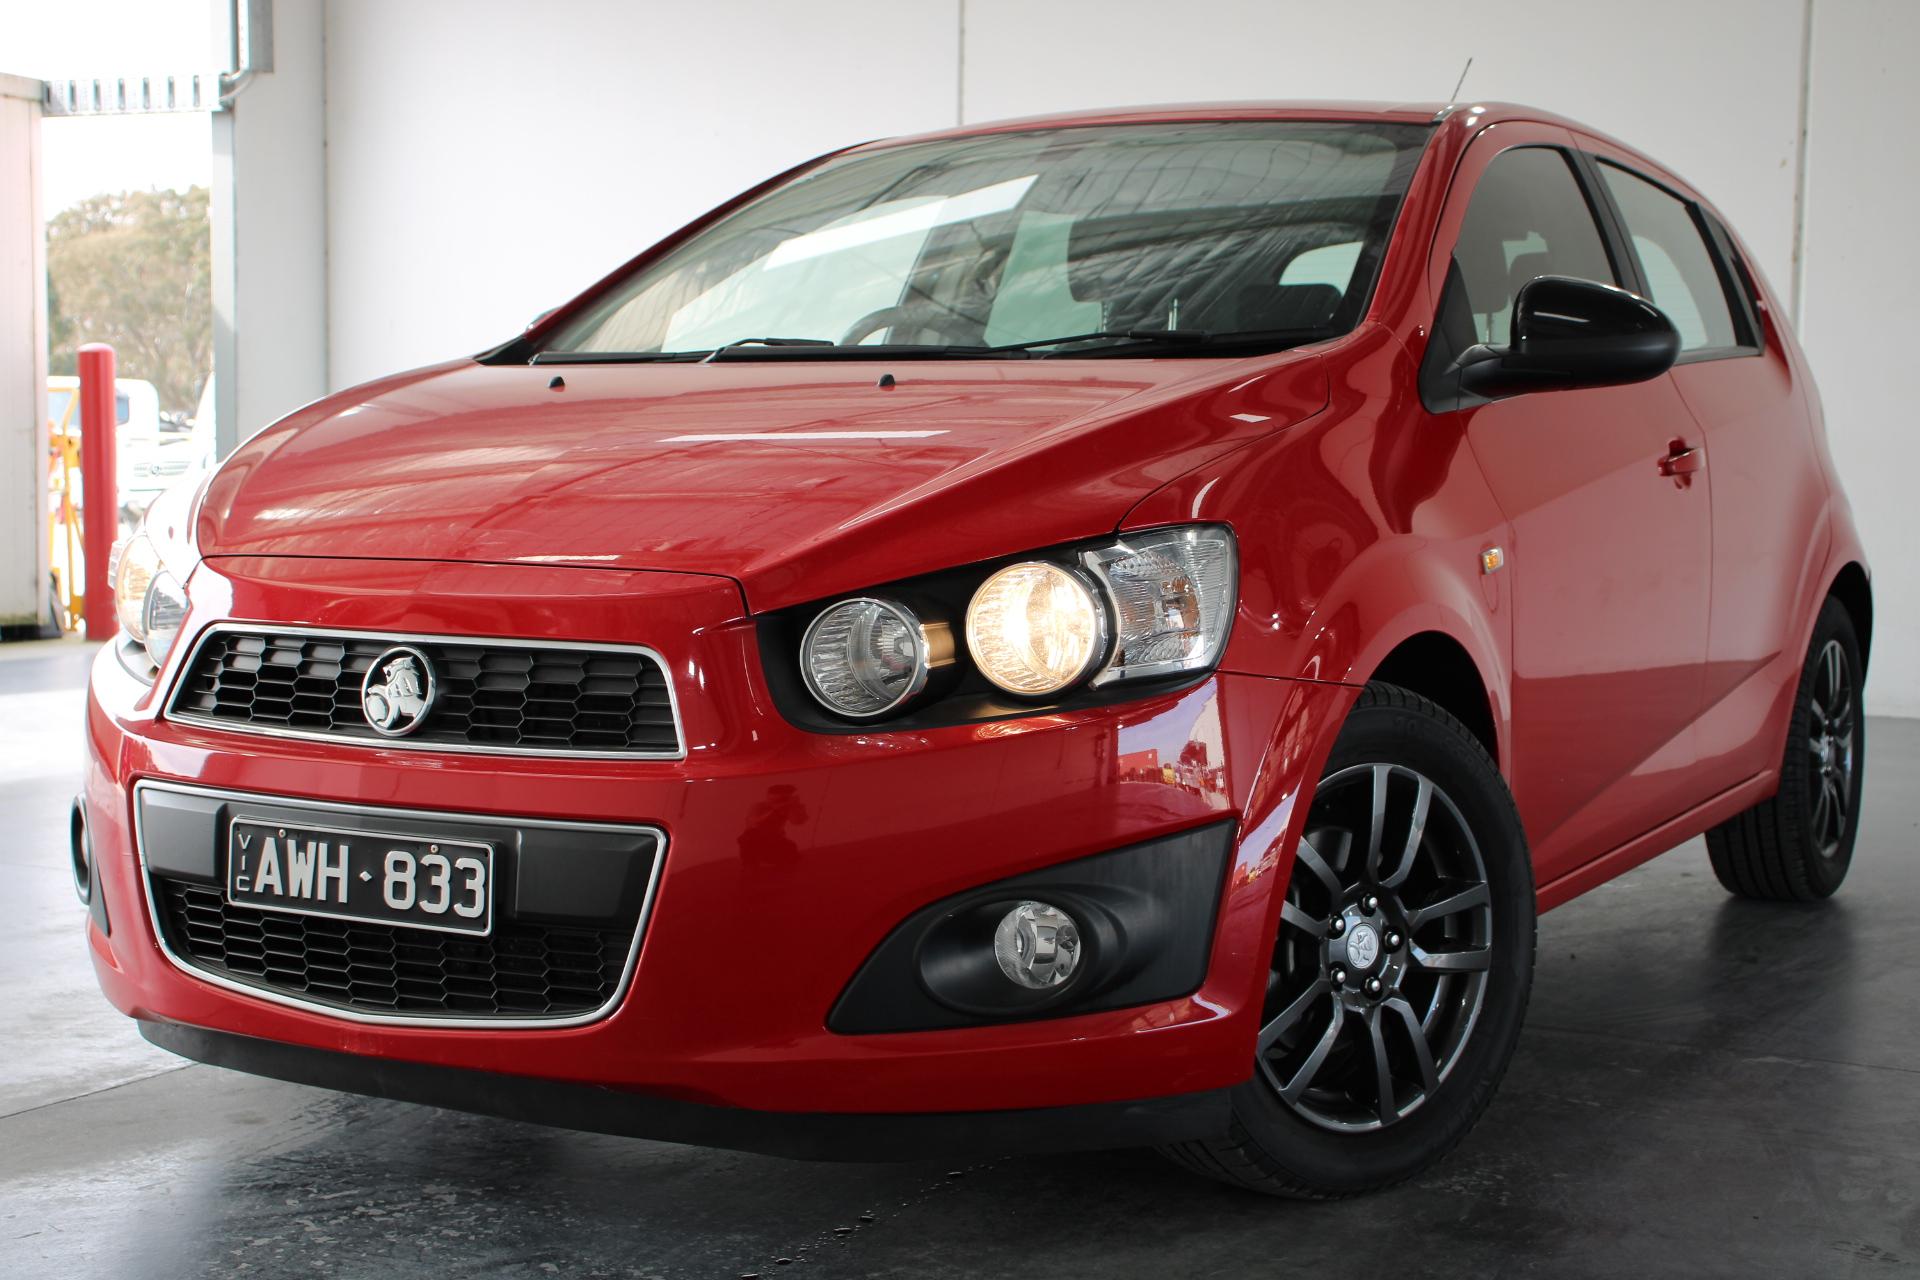 2015 Holden Barina TM Automatic Hatchback